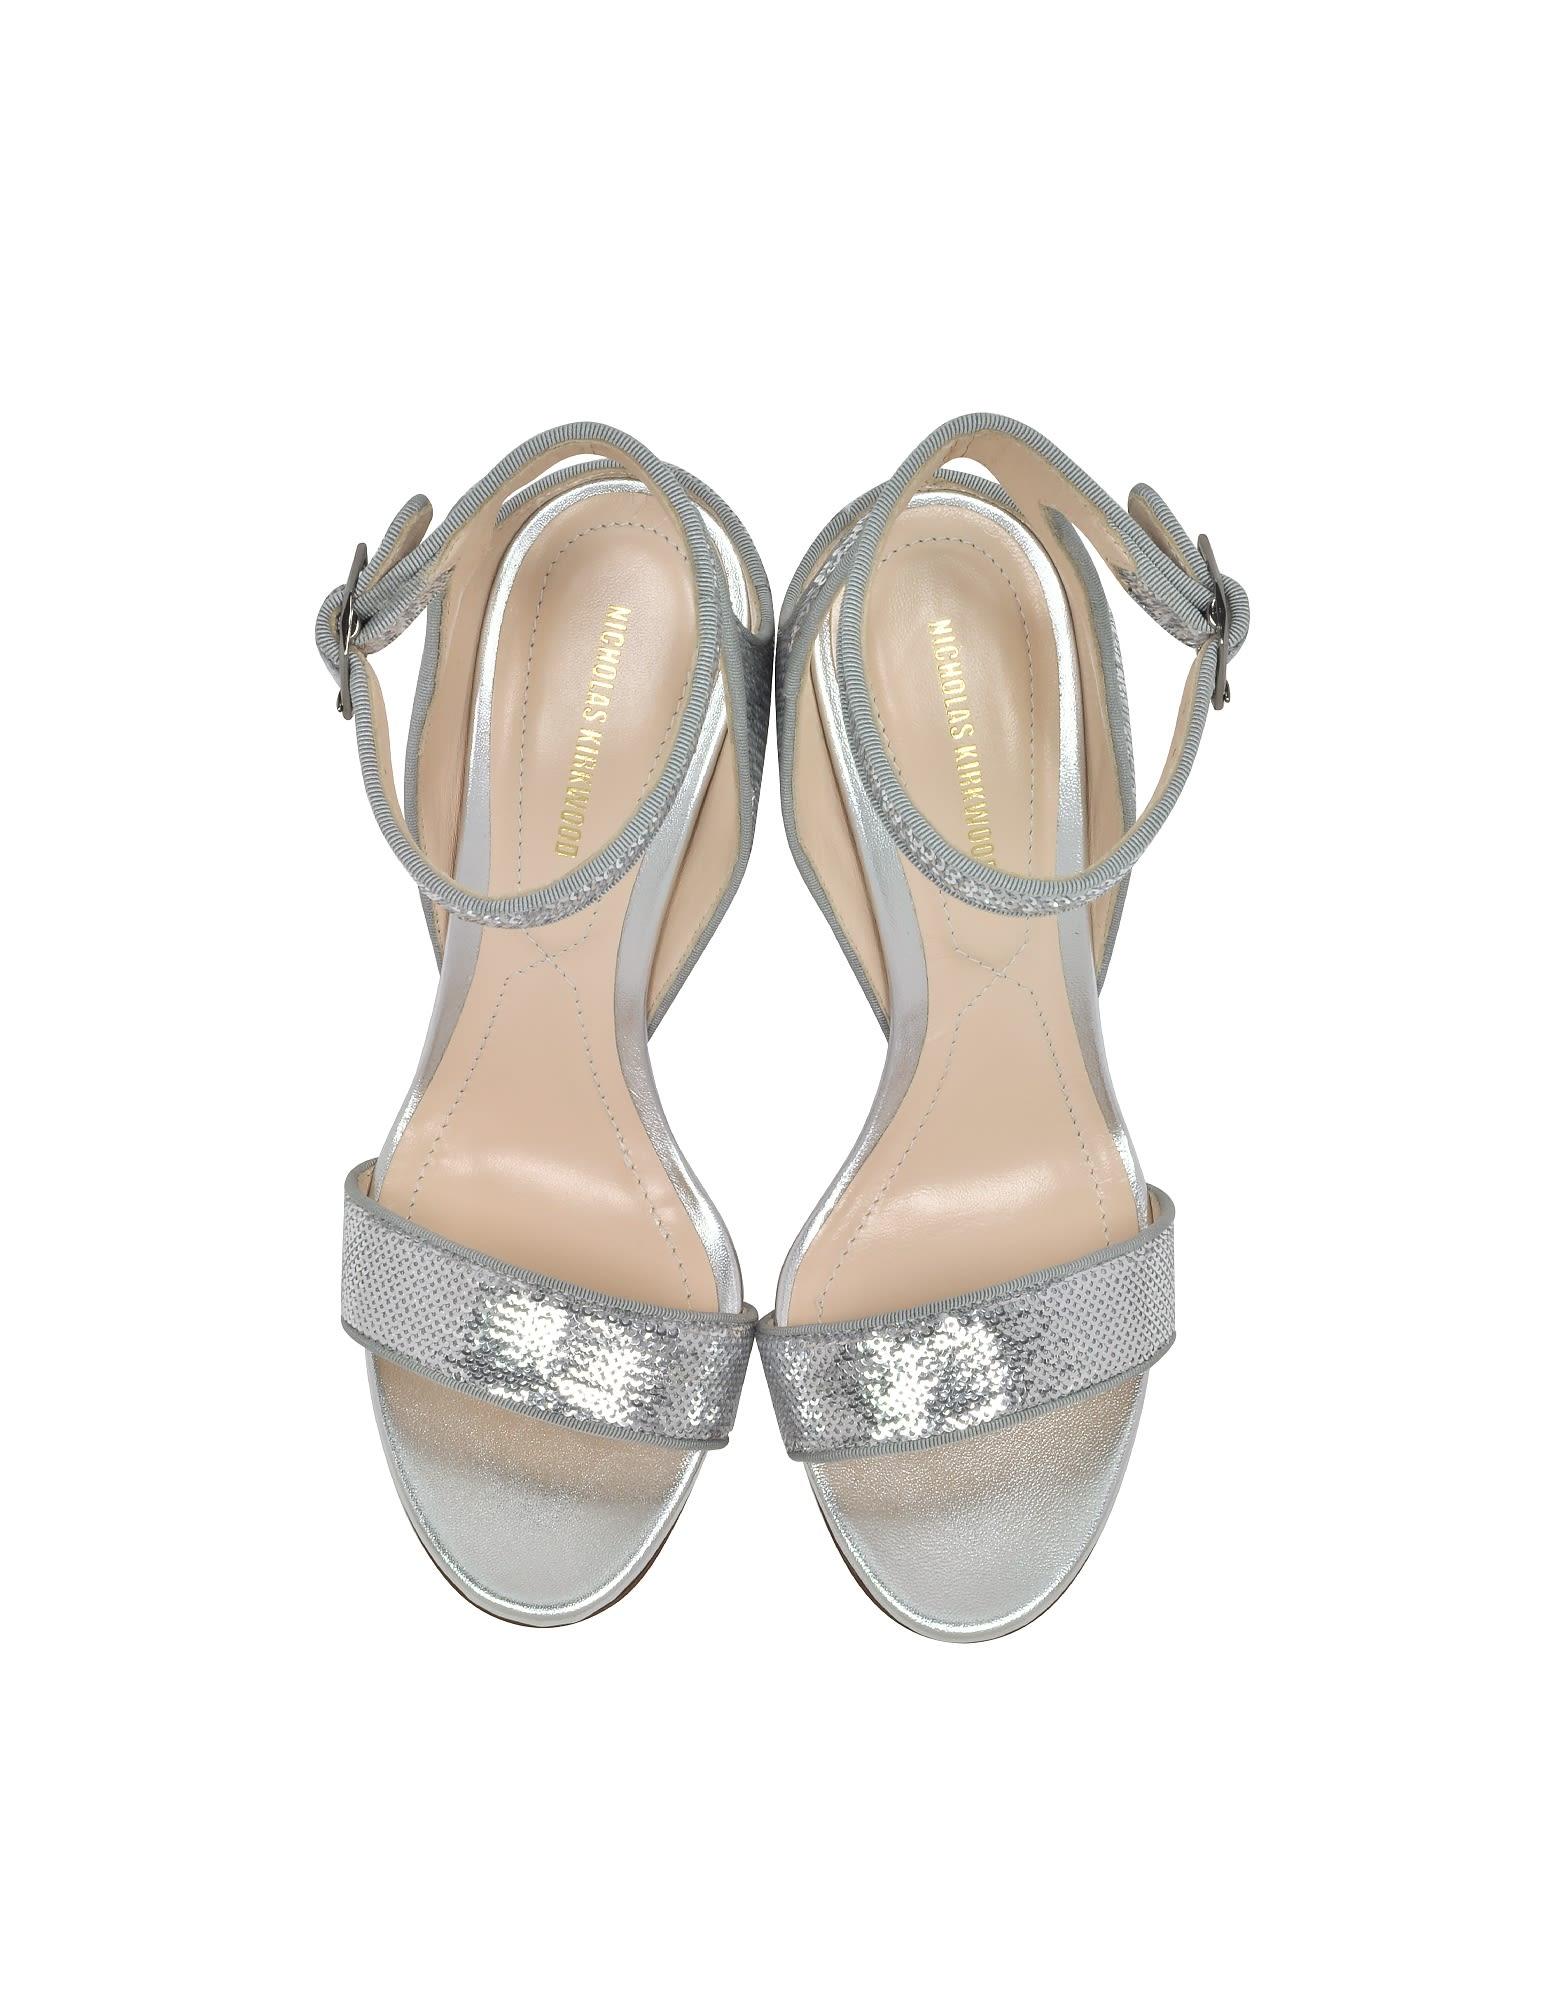 24f1bd1a5e4 Nicholas Kirkwood Nicholas Kirkwood Silver Sequins 90mm Lola Pearl ...